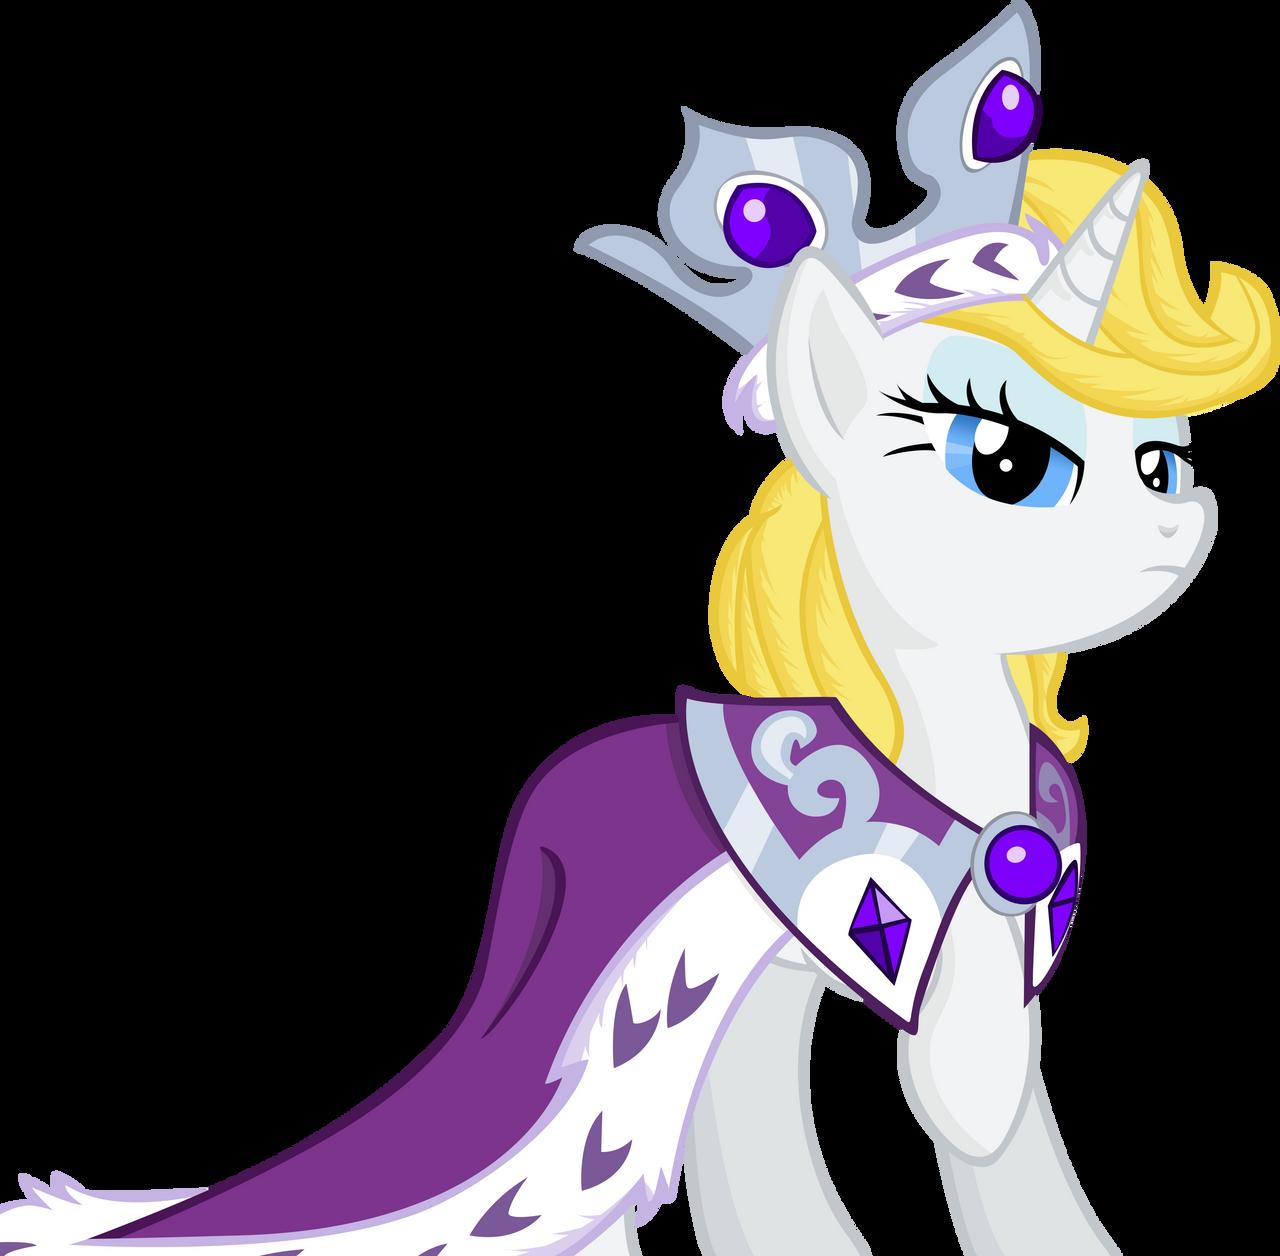 Princess platinum vector by anevilzebra on deviantart